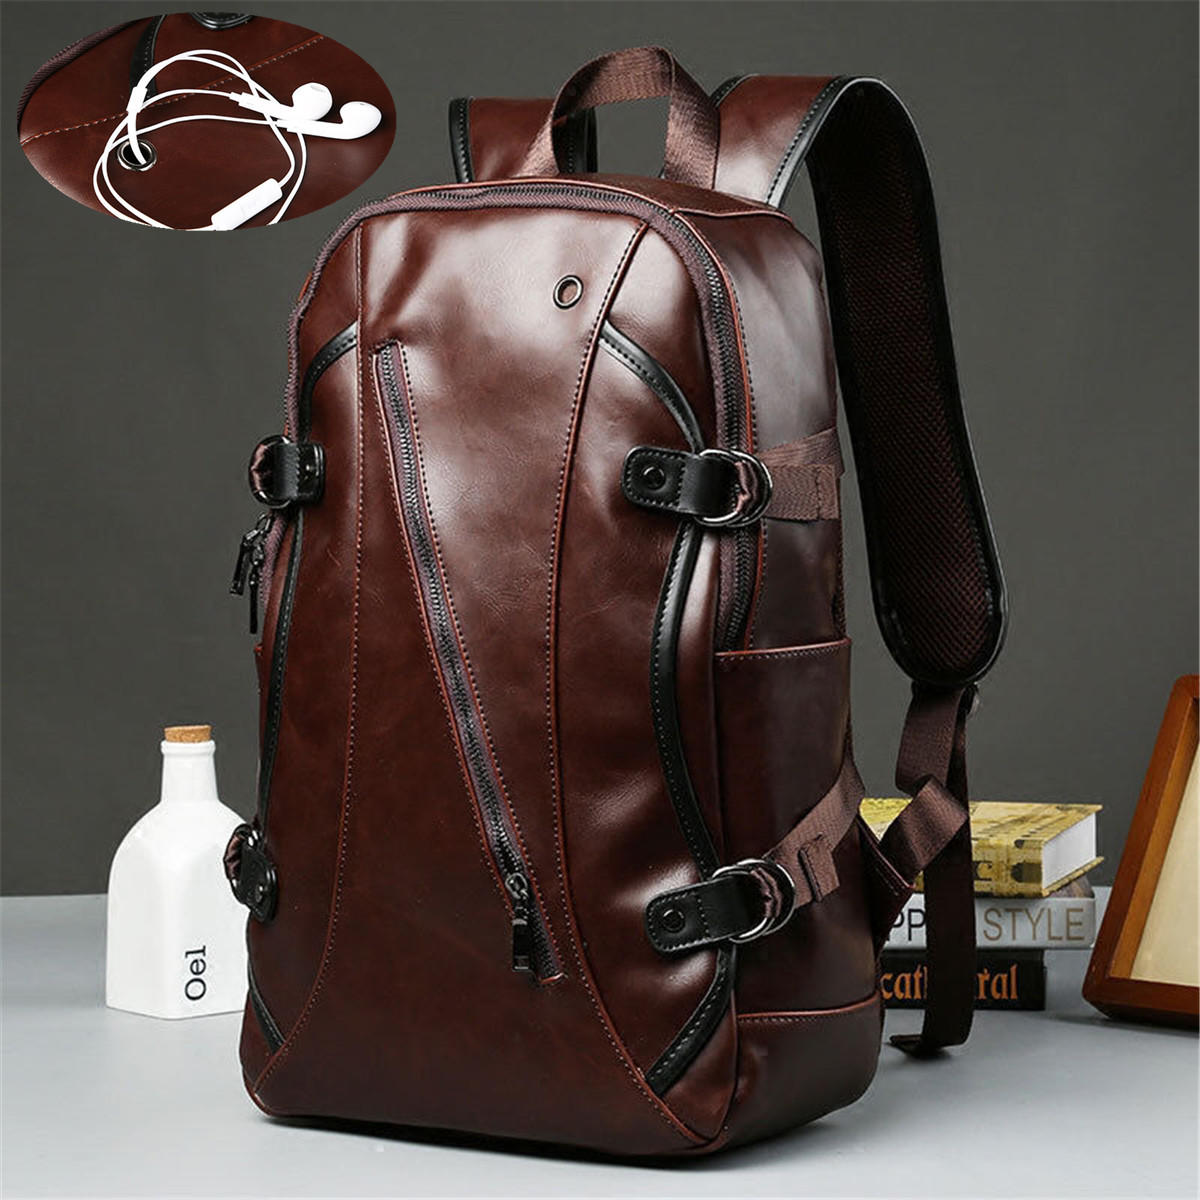 Men Leather Backpack Waterproof Laptop School Bag Travel Satchel Rucksack Large